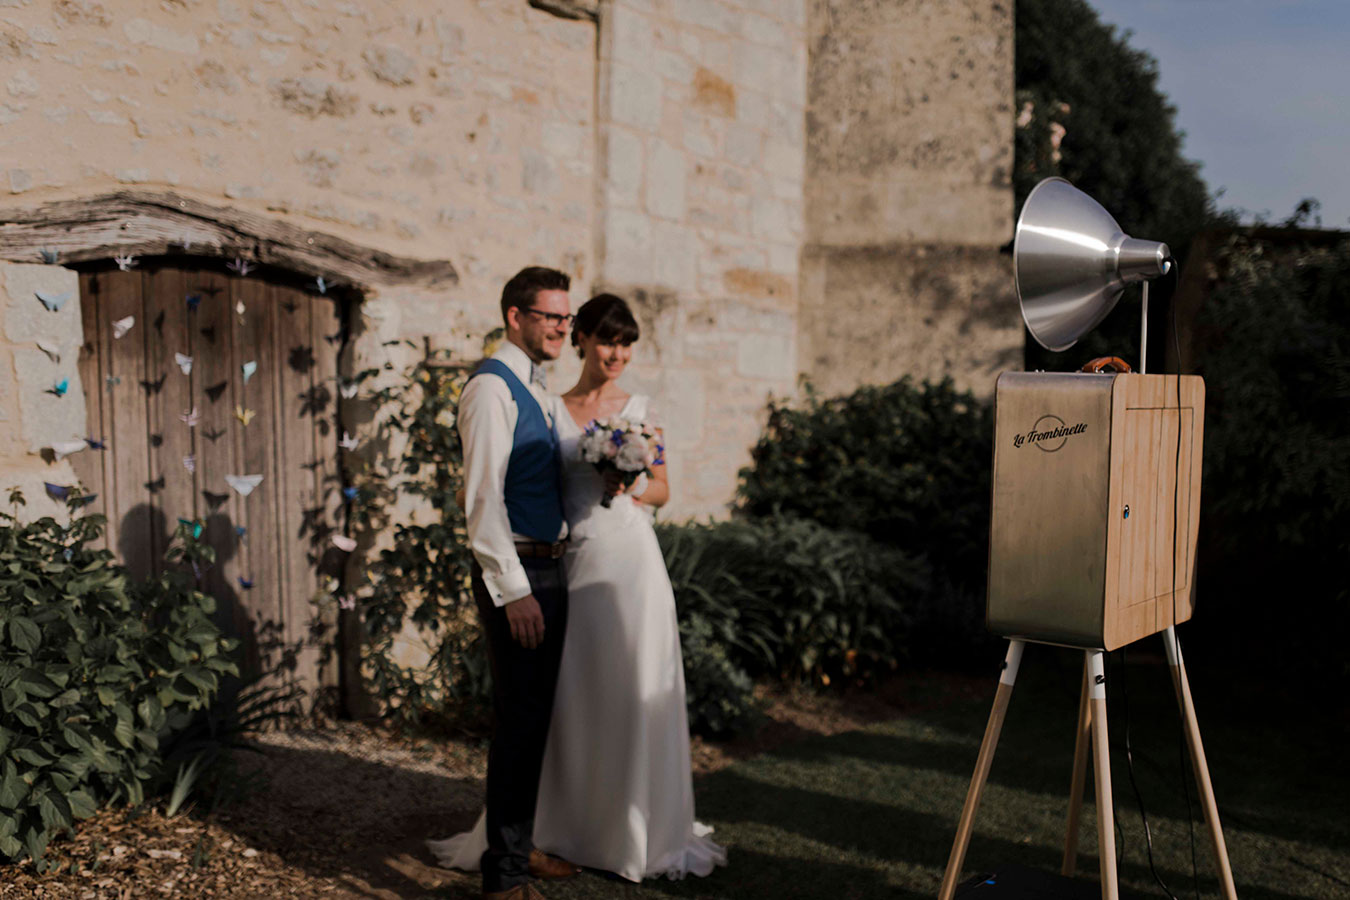 photobooth mariage en Normandie. Location à Caen